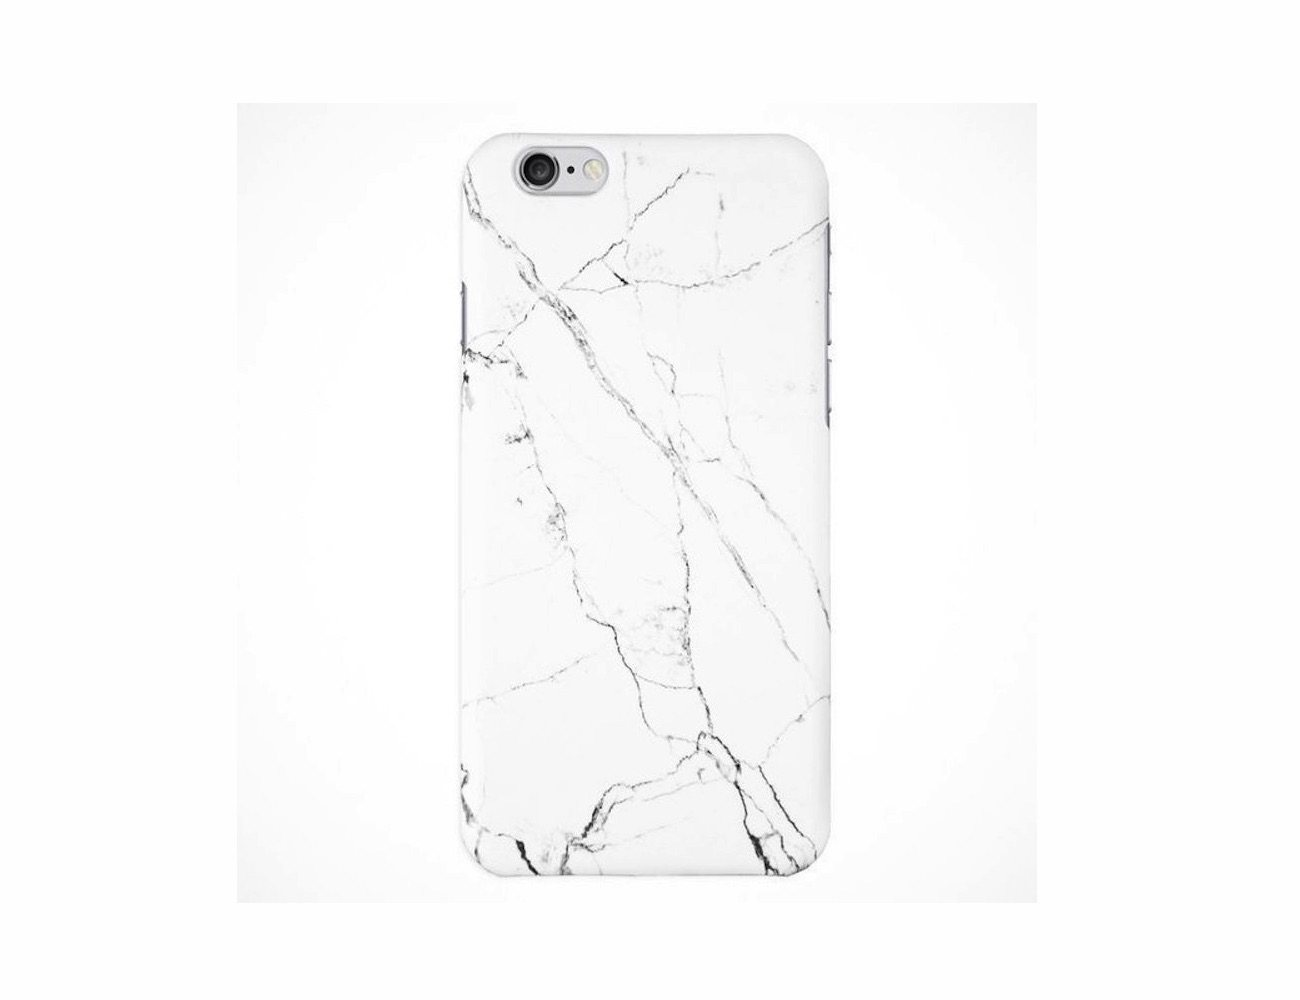 White Marble iPhone 6 Plus Case by Queu Queu